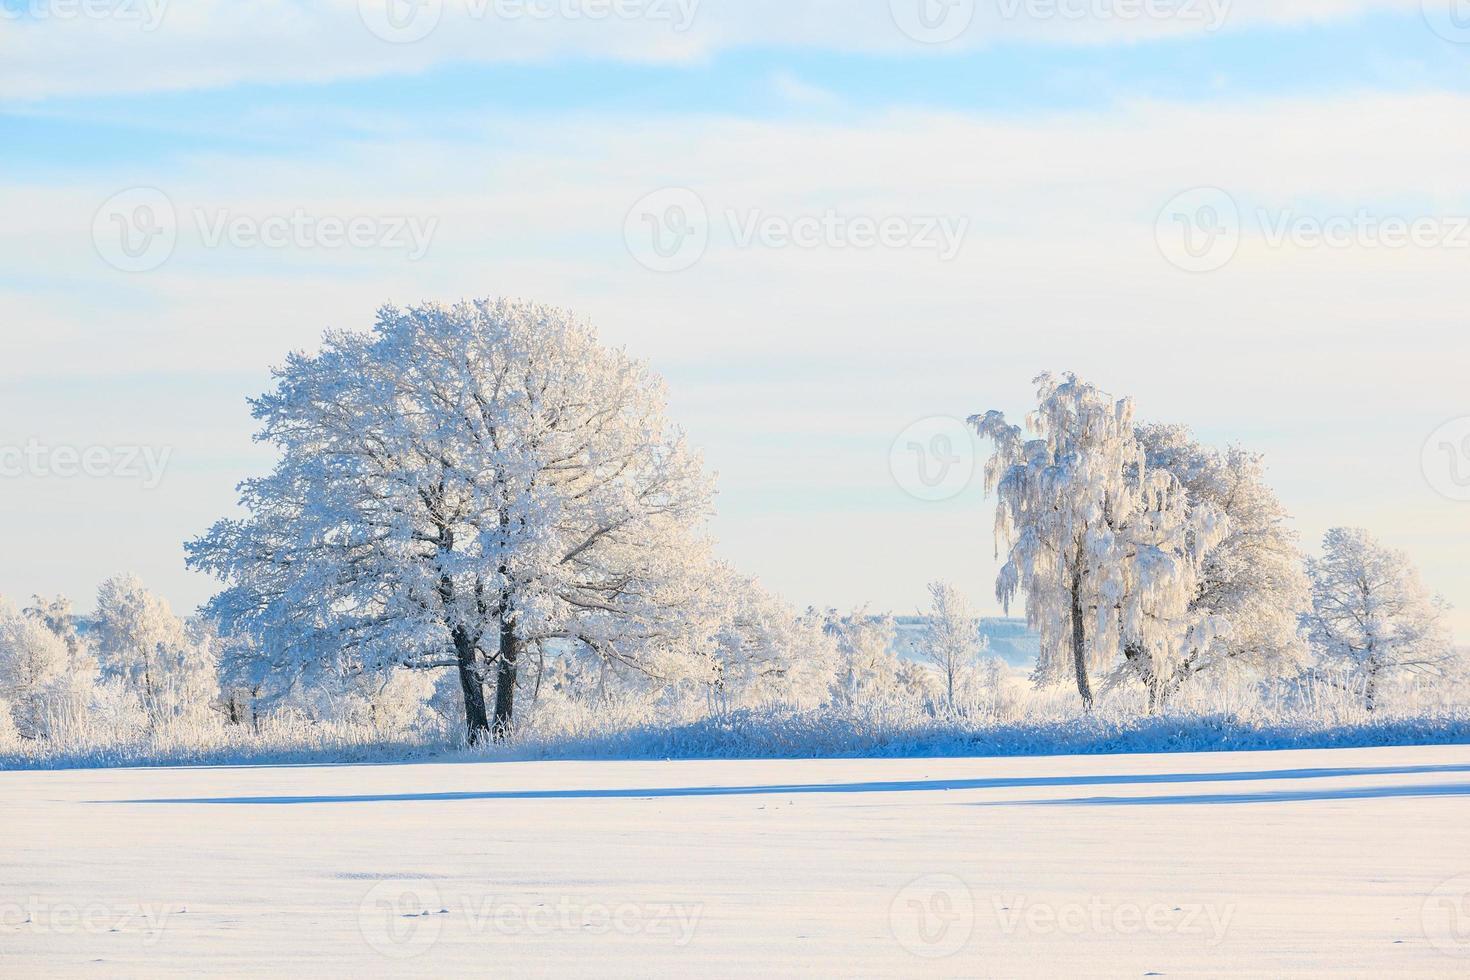 frostigt träd i snöig landskap foto